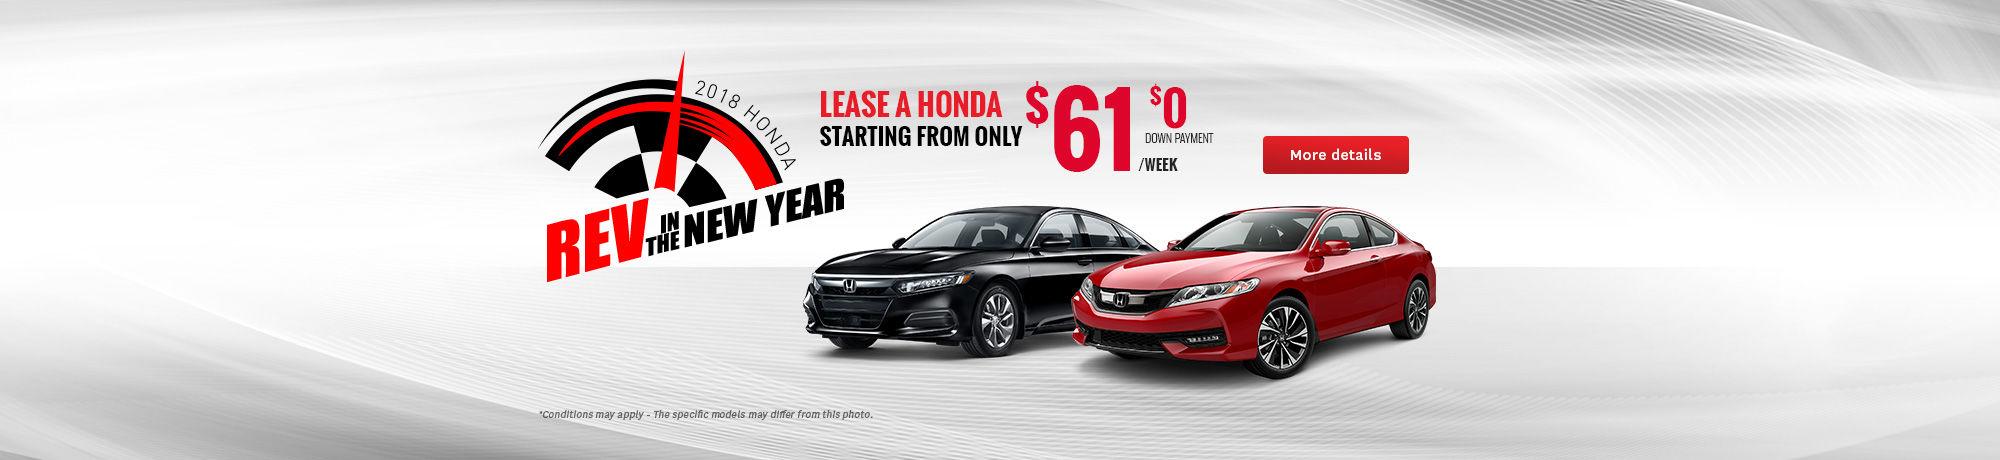 Bring Home a Honda - February